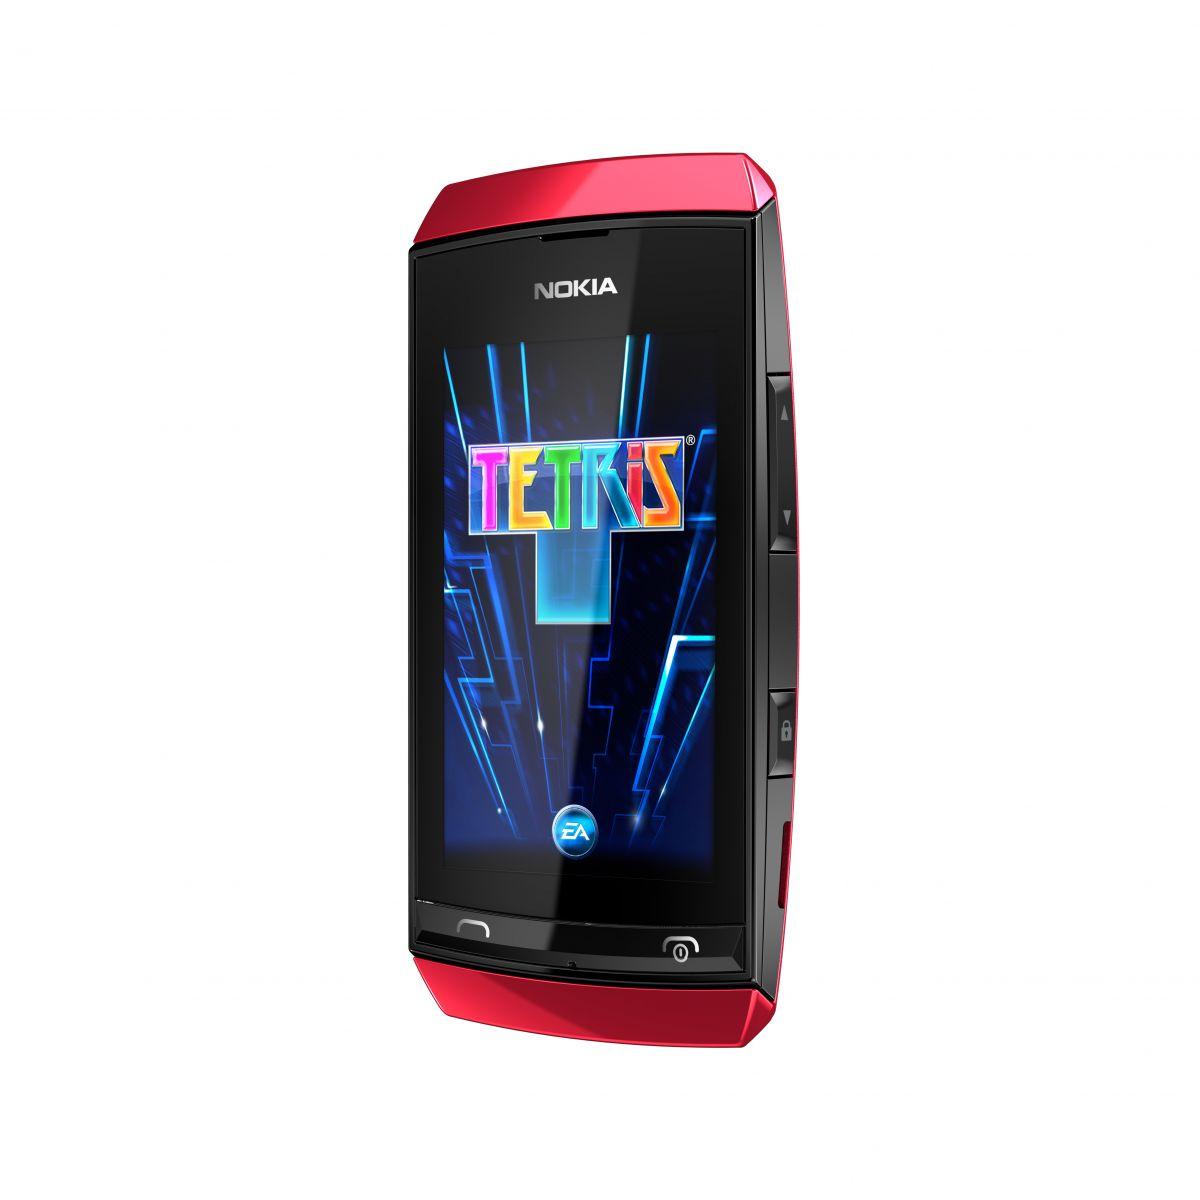 http://1.bp.blogspot.com/-XnfDLcqnriY/UBQI9II3zeI/AAAAAAAADBE/dLslxE1ZOiM/s1600/Nokia+Asha+305-9.jpg